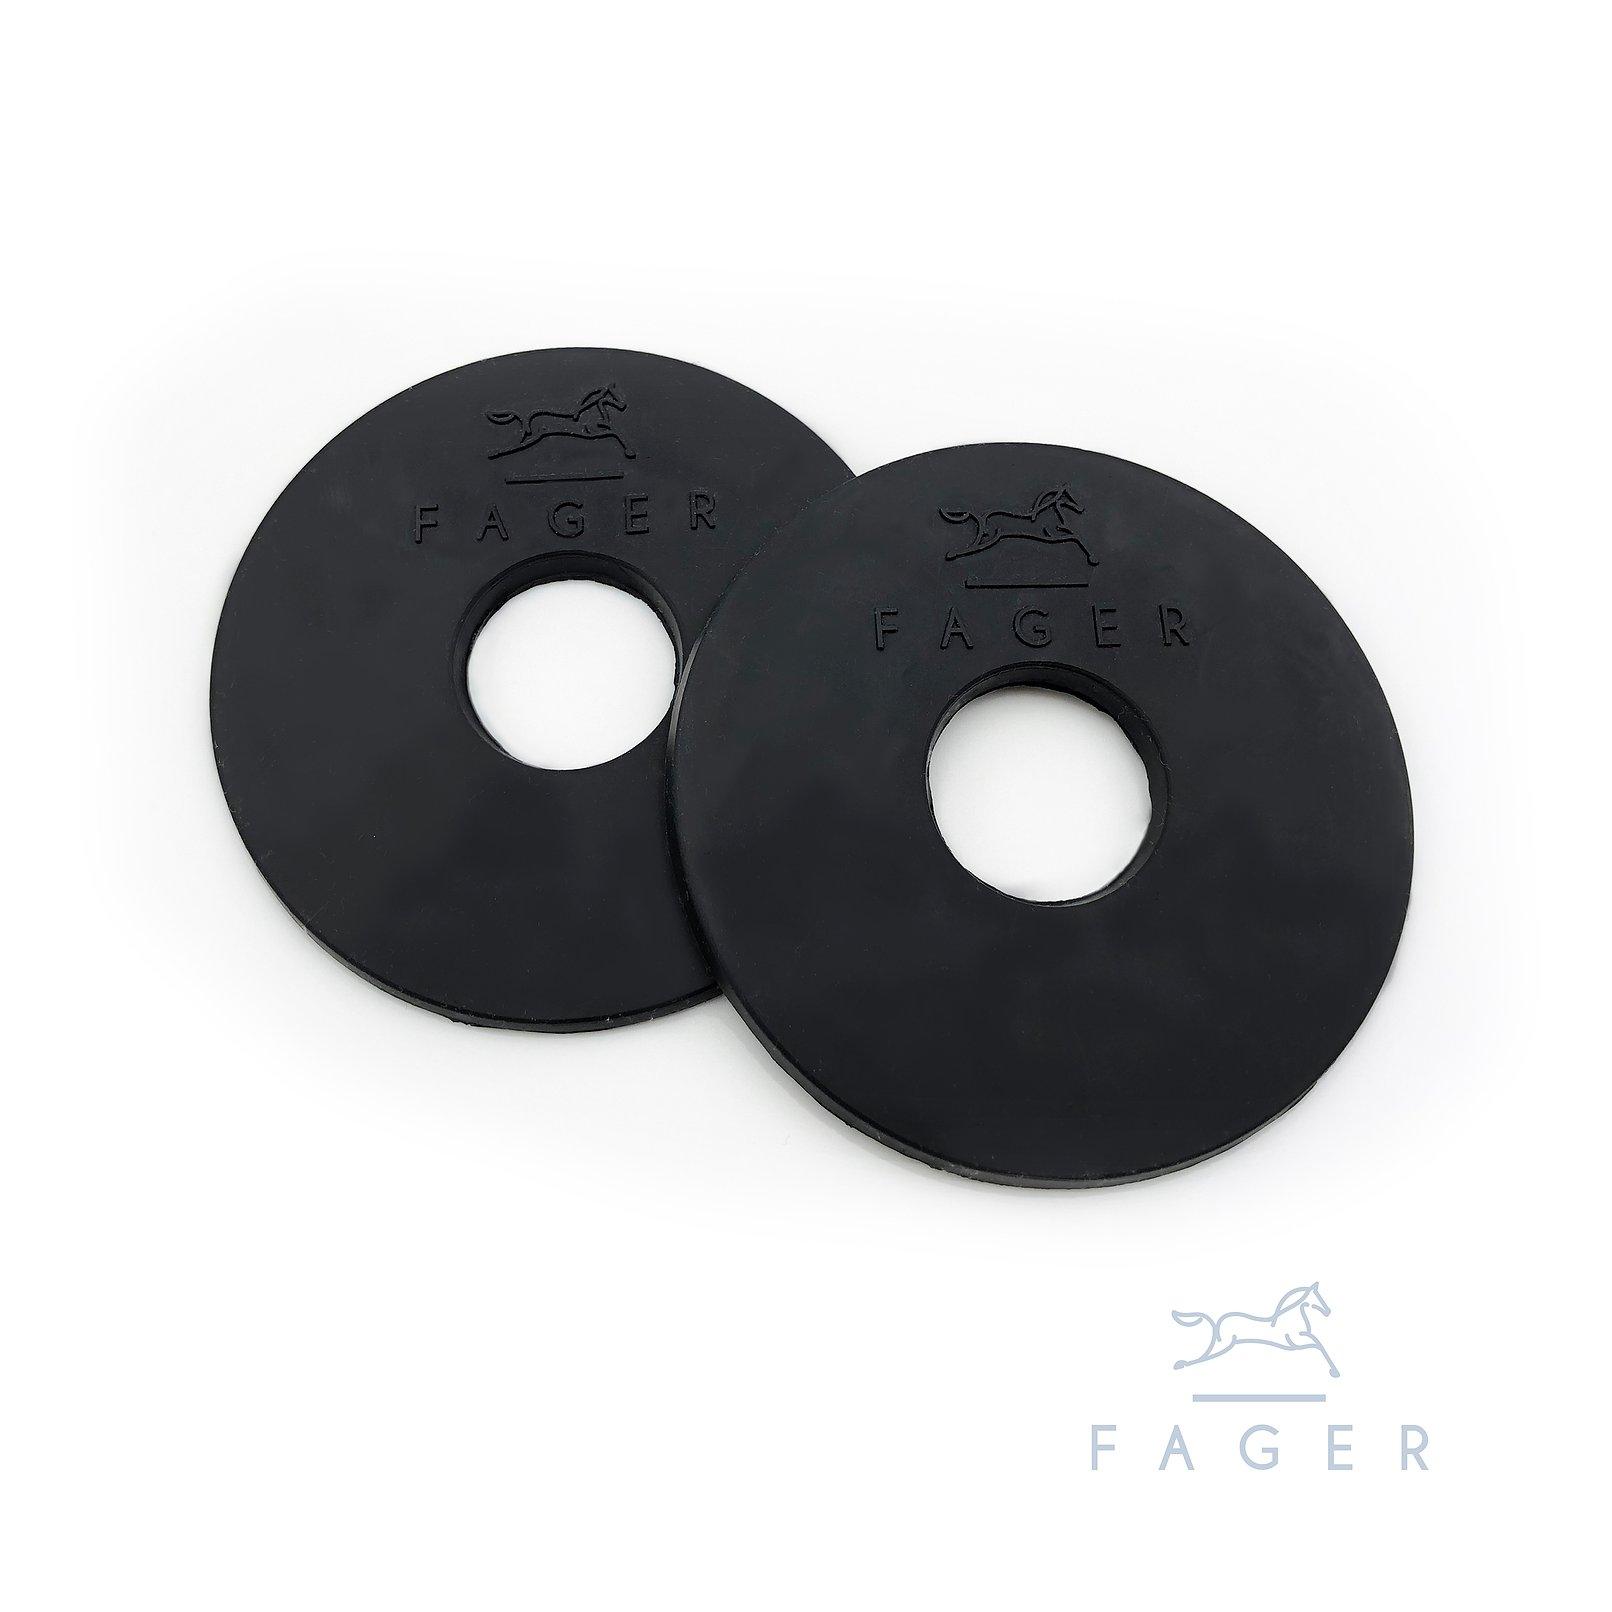 fager bit guard black